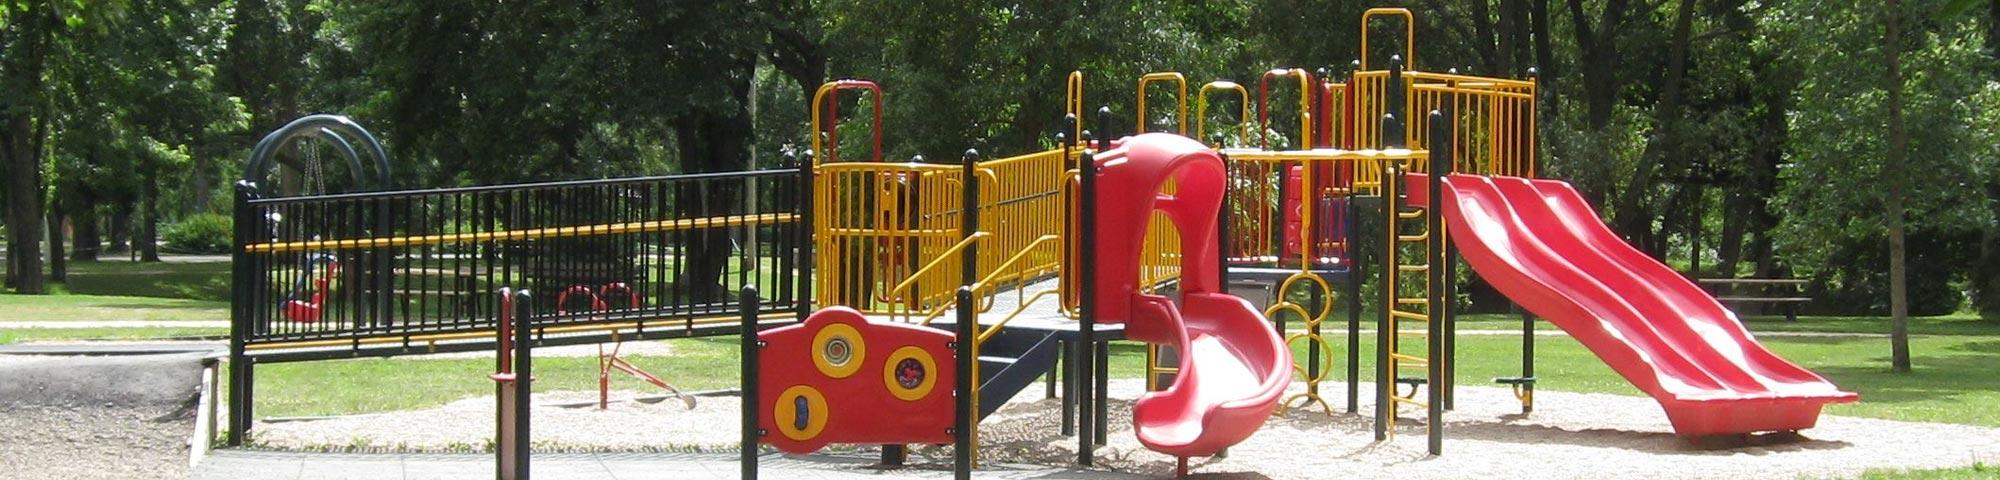 Equipamiento para Parques Infantiles